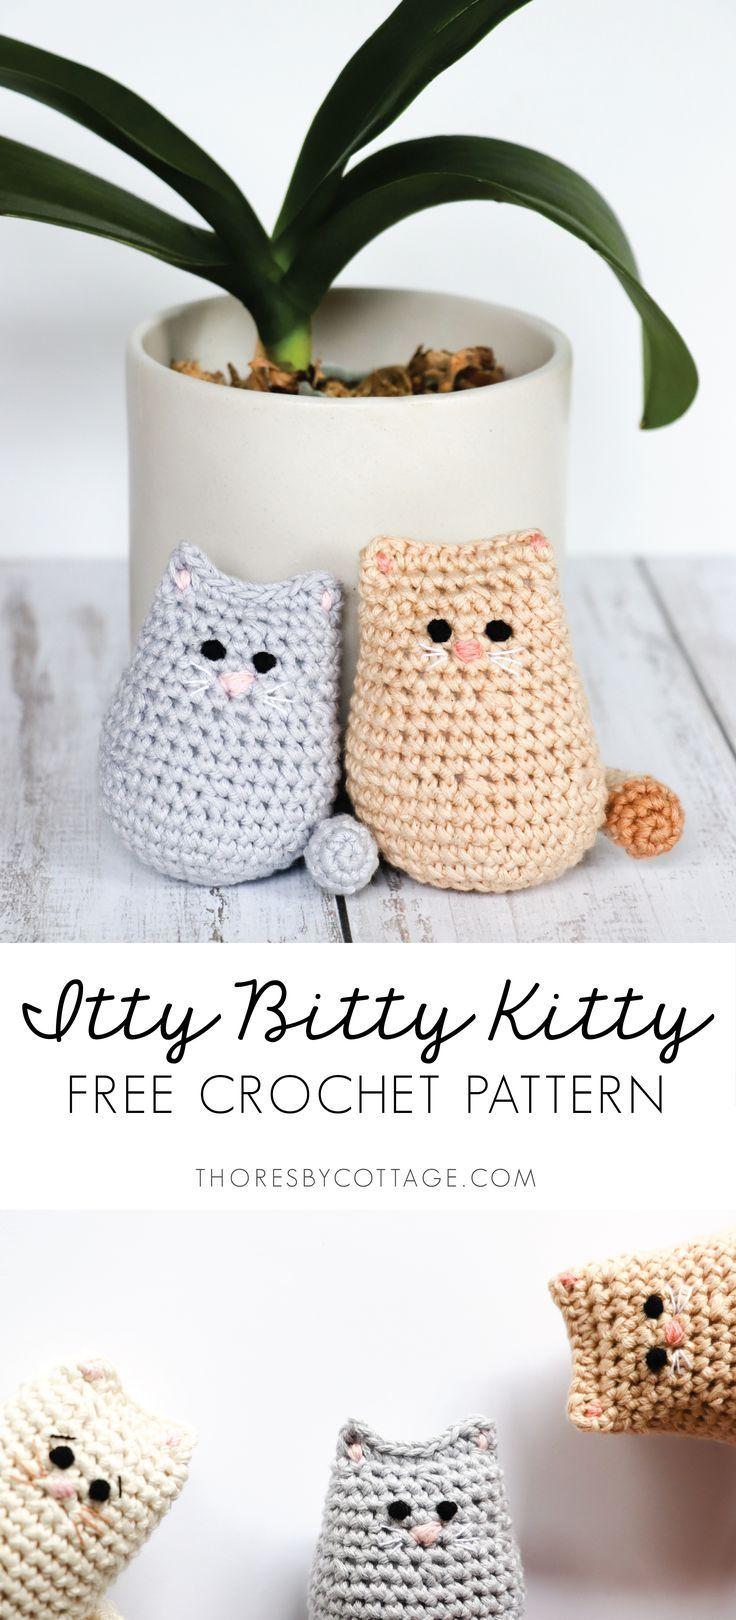 Itty bitty crochet kitty | Maggie\'s Crochet - All About Crocheting ...